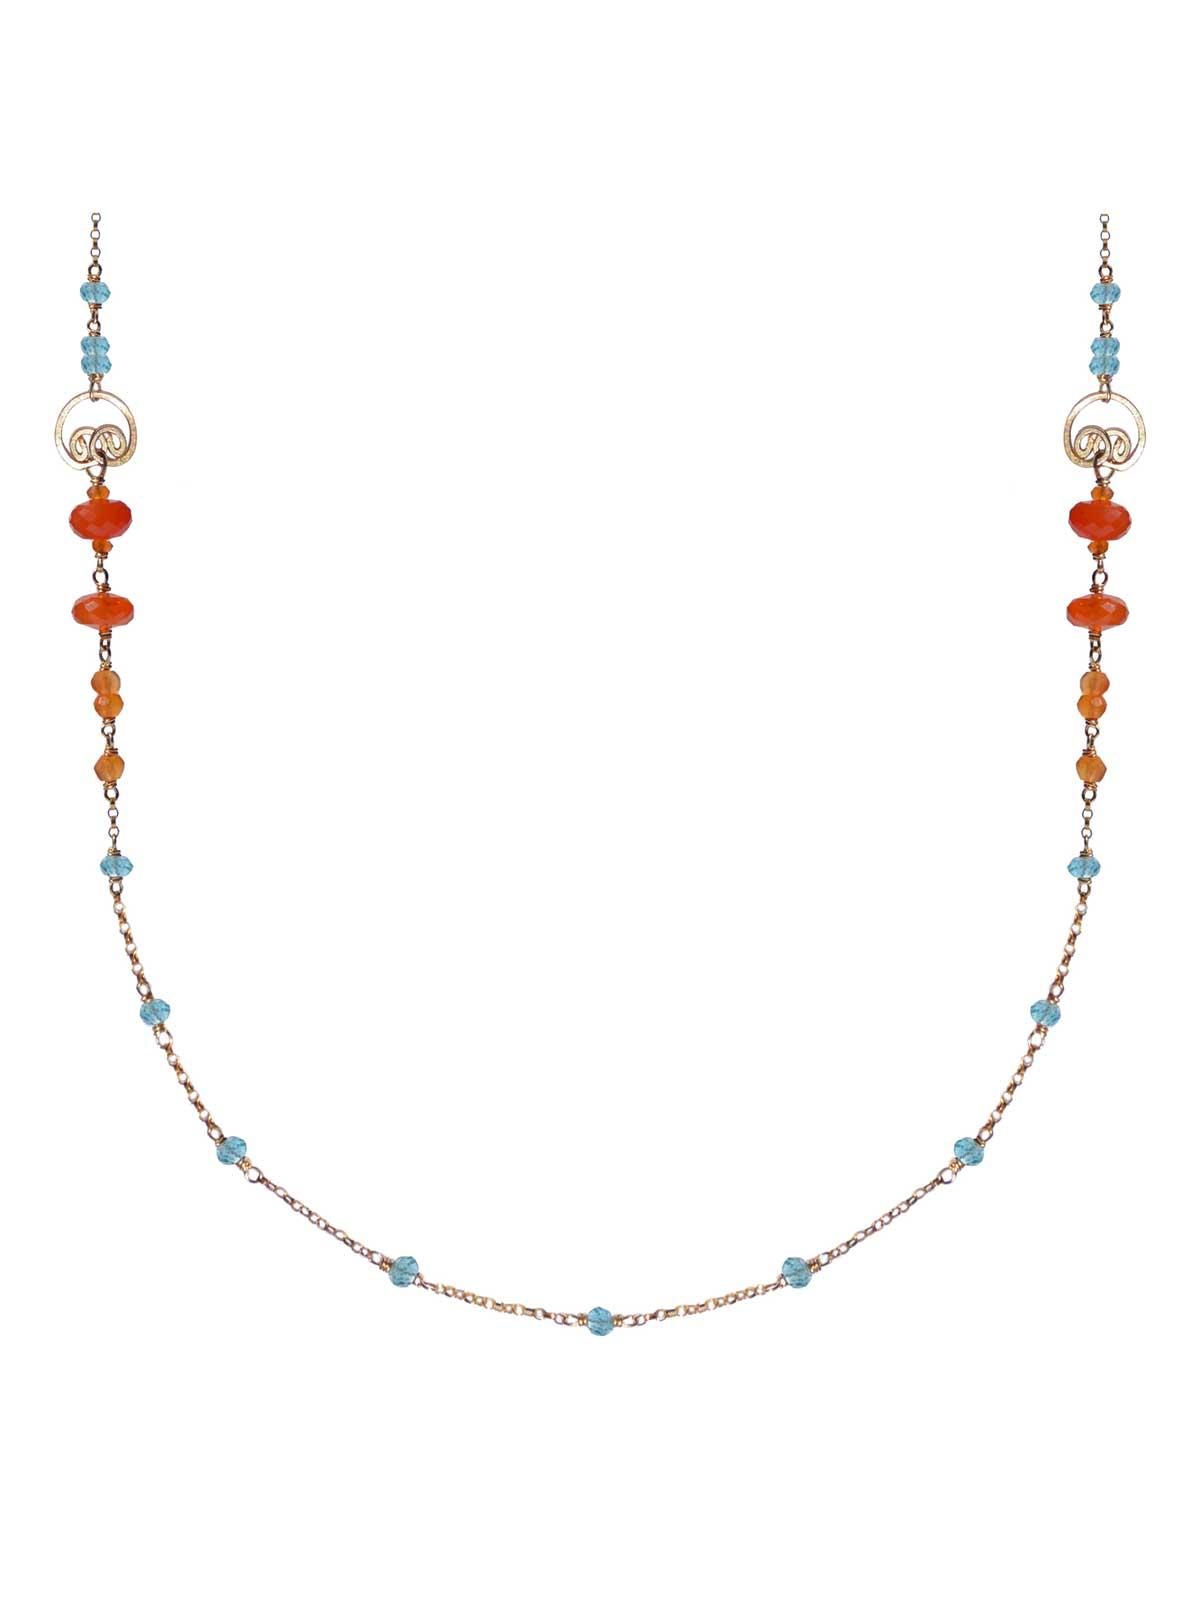 corail Necklace gold Carnelian Apatite